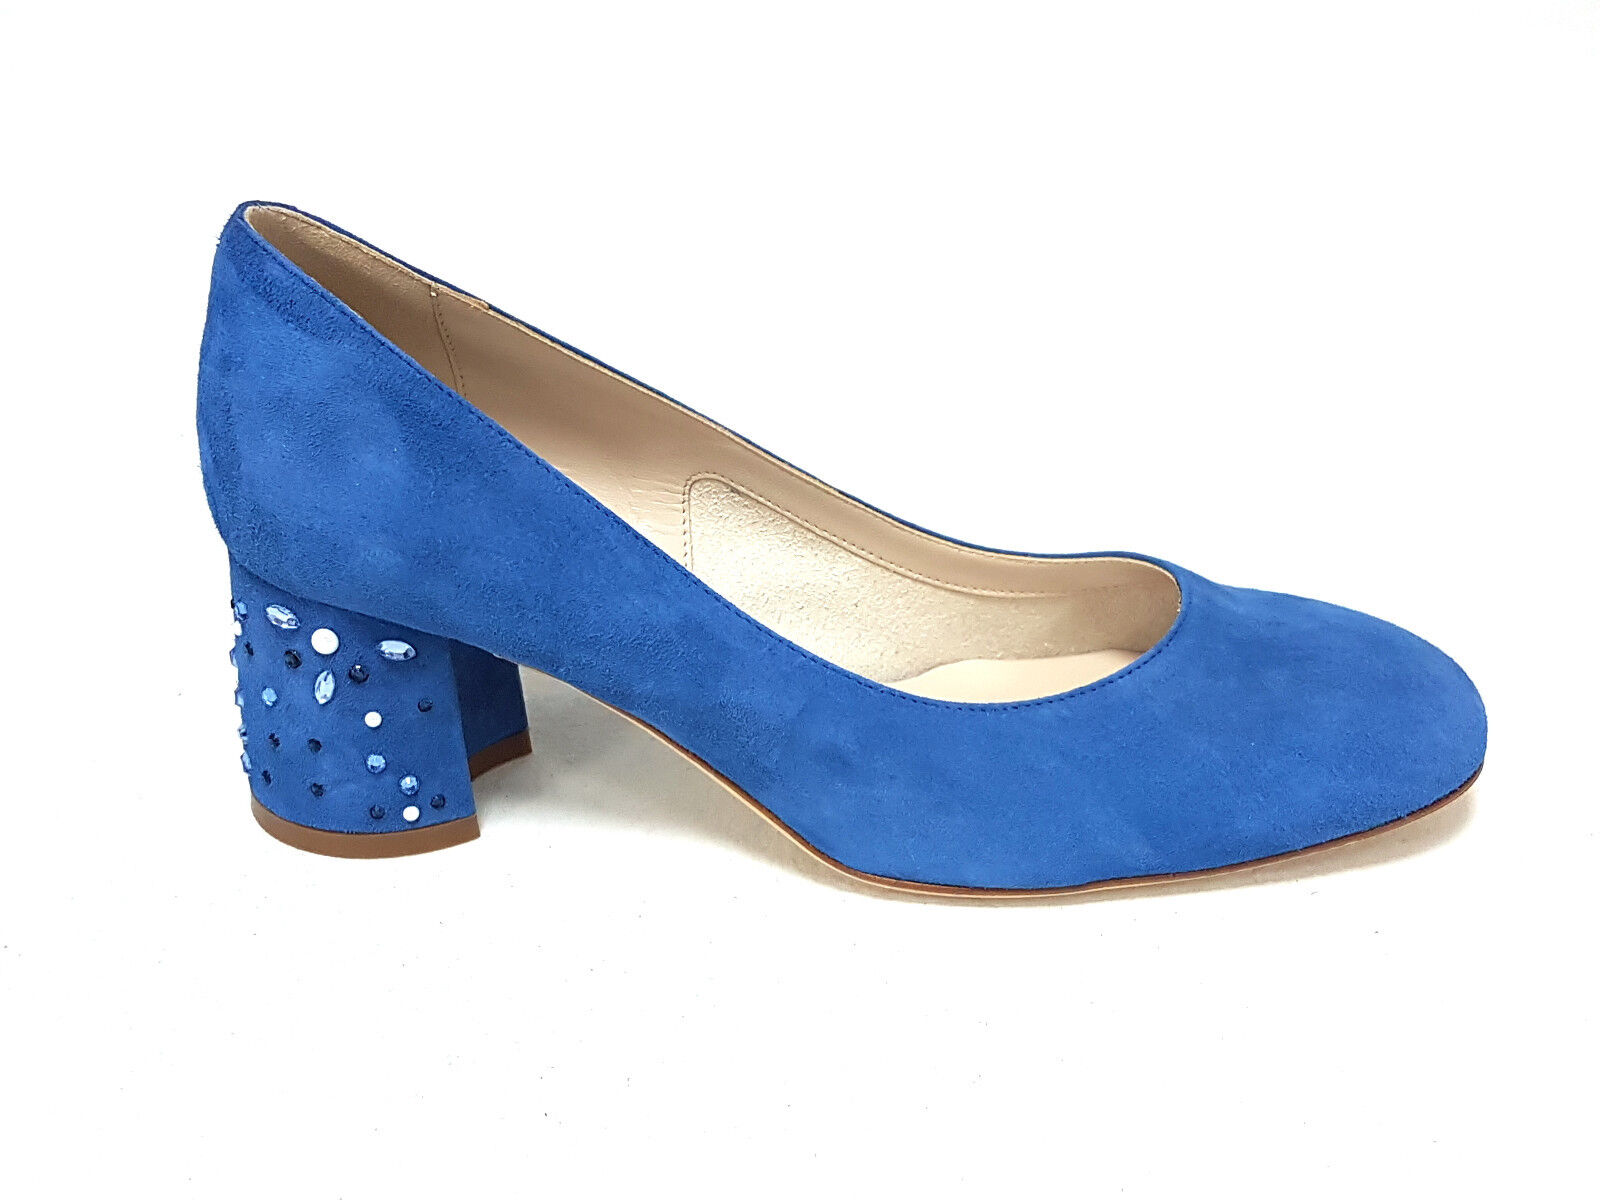 Melluso donna decoltè donna Melluso d122s deep blu n°37 beb644